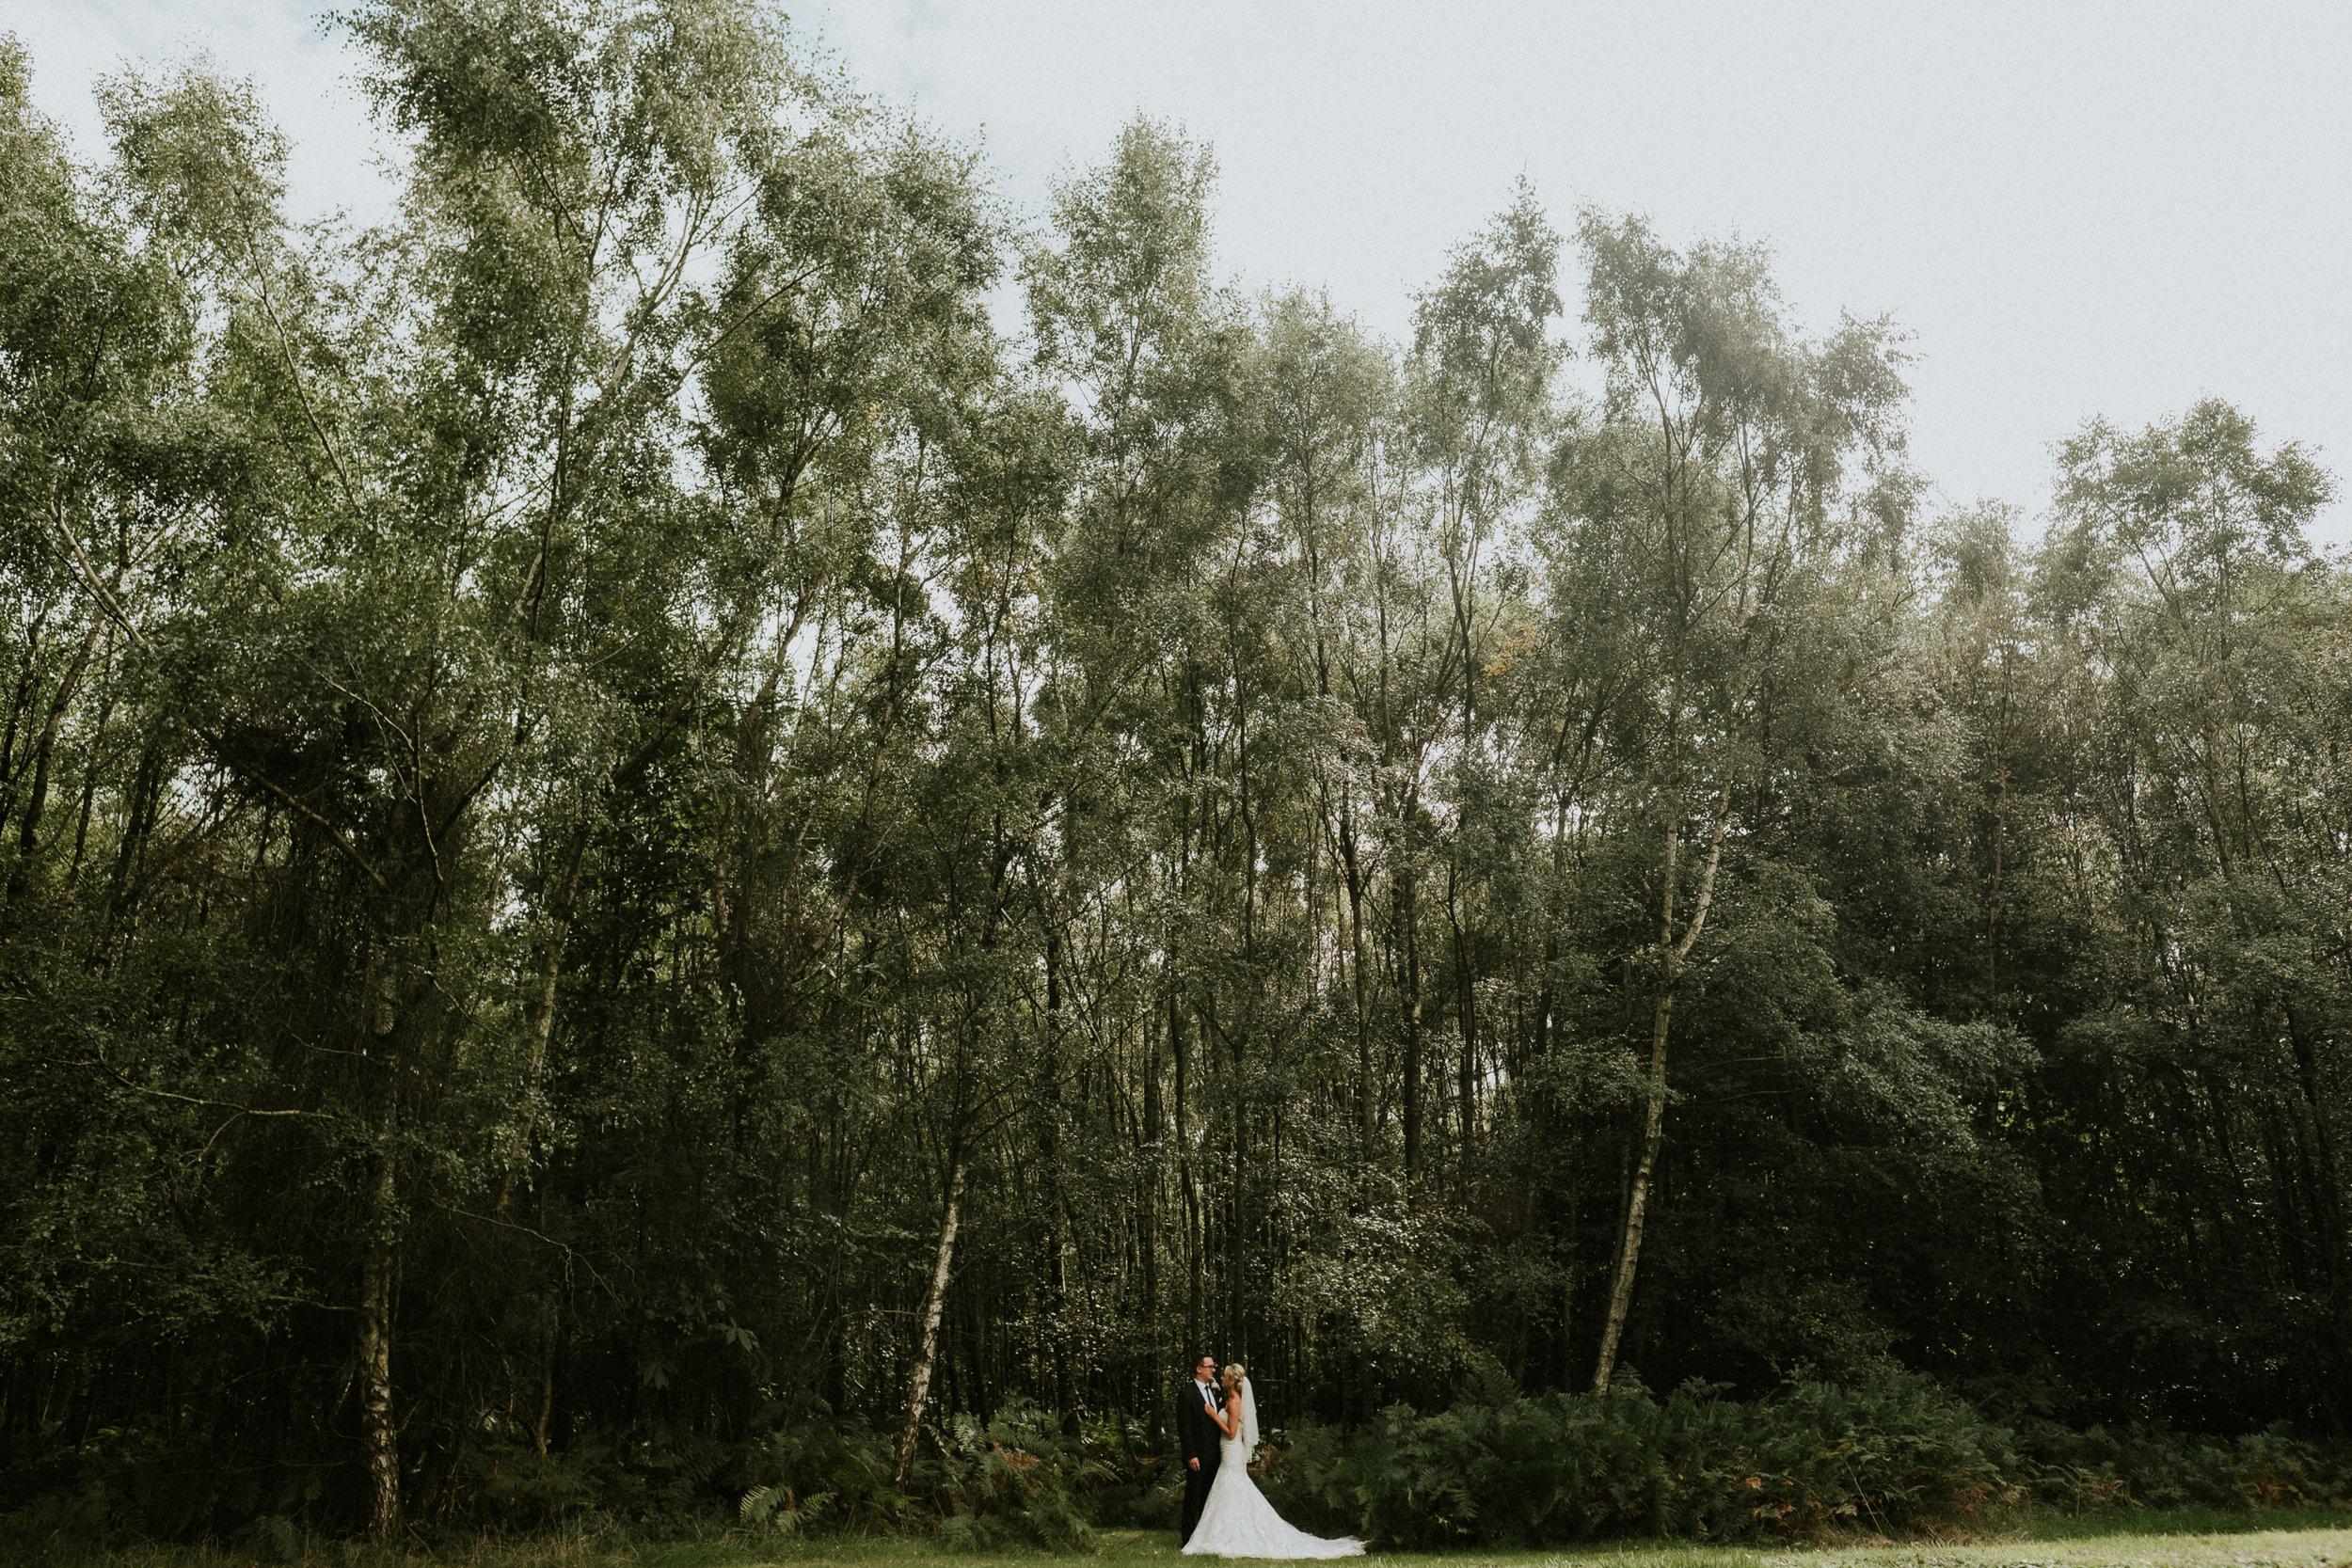 70 Kent wedding photographer creative fun joanna nicole photography 2.jpg